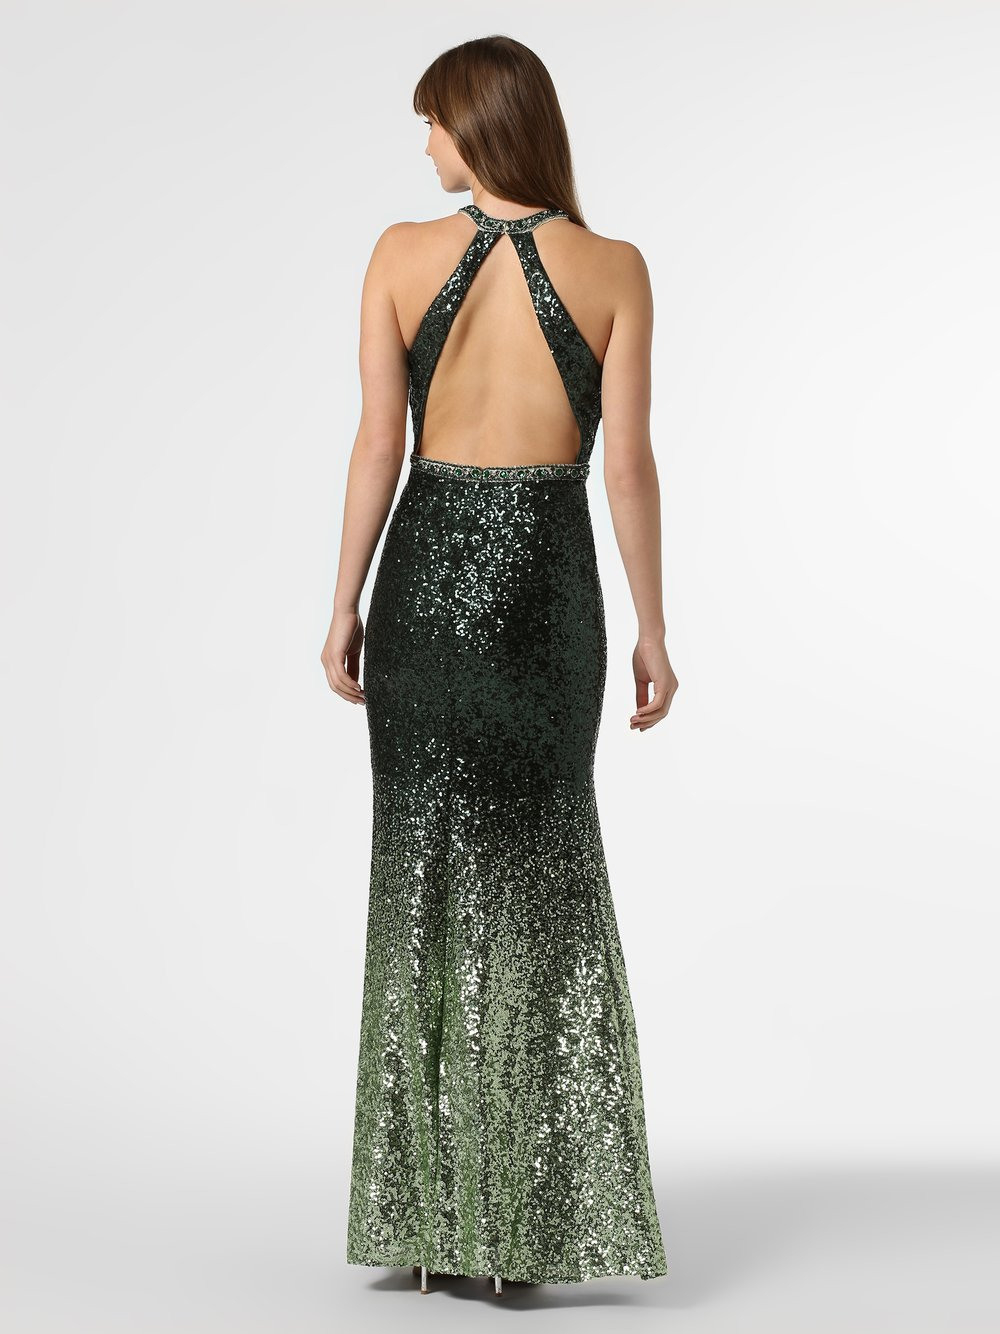 17 Einzigartig Abendkleid Mascara ÄrmelFormal Perfekt Abendkleid Mascara für 2019